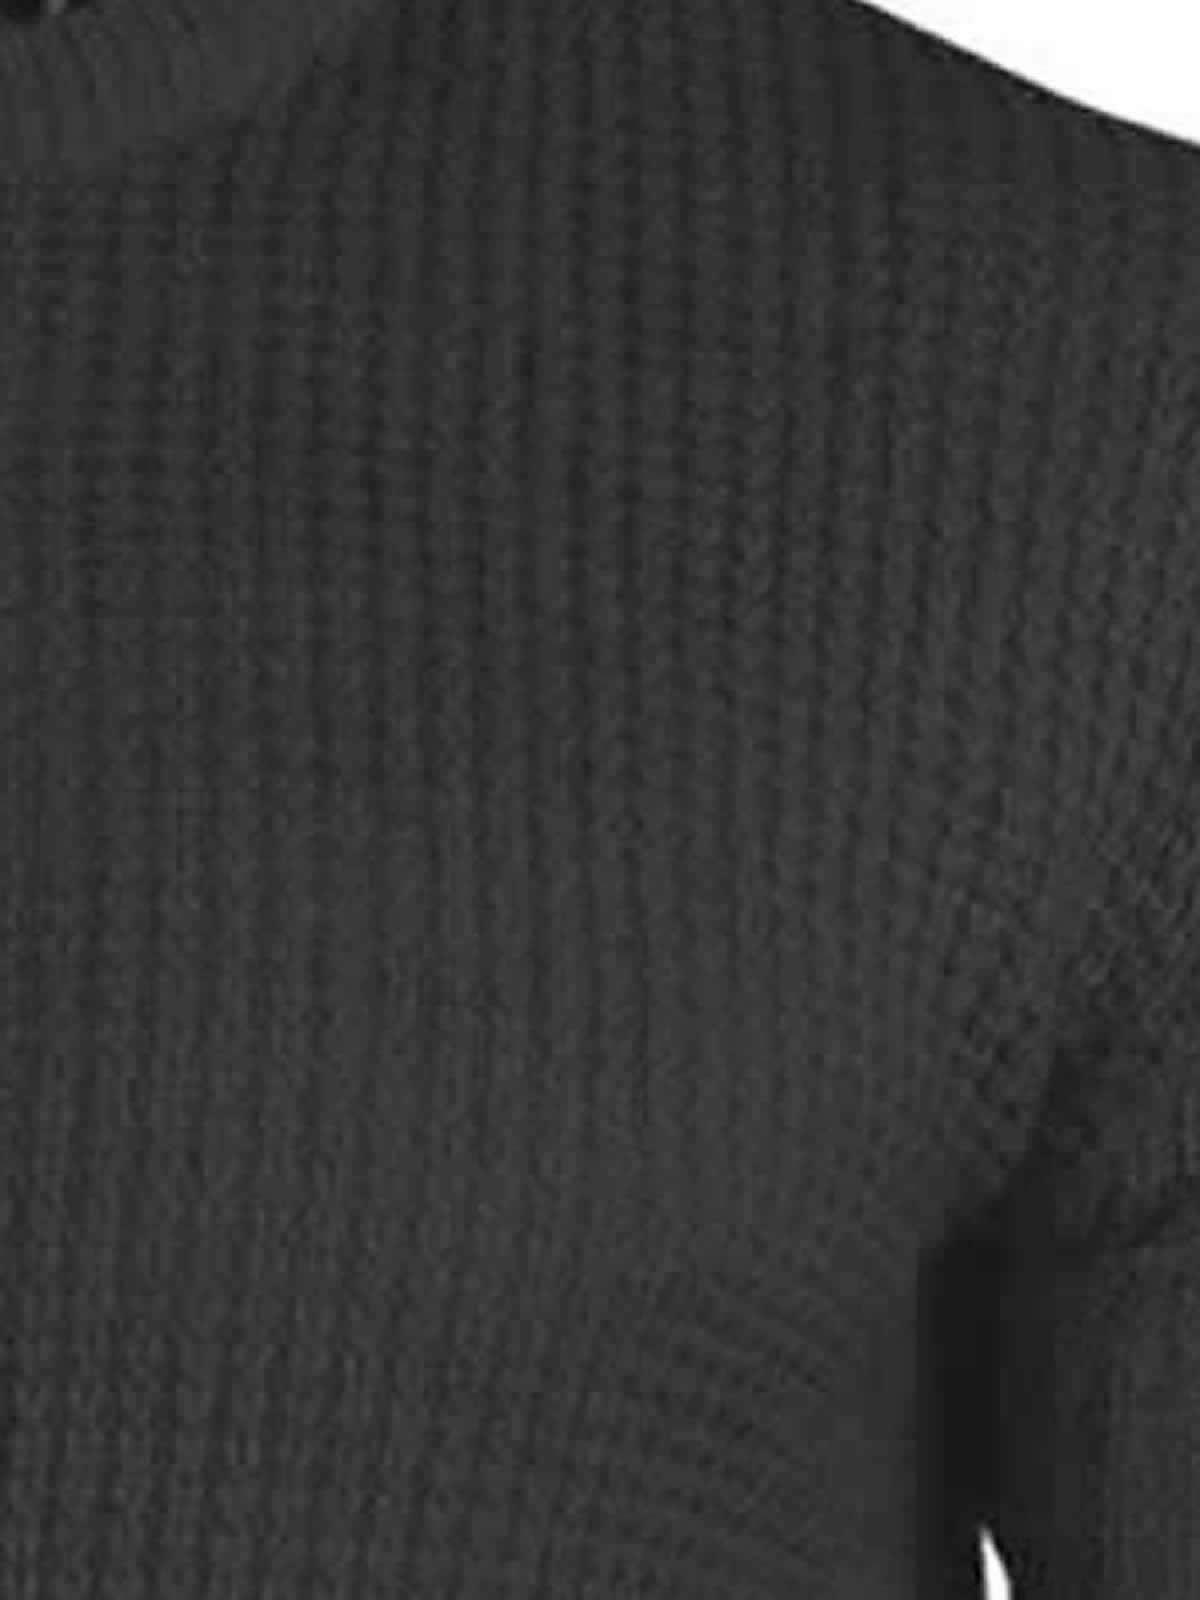 Para-hombre-Jersey-Alma-valiente-slowak-Pescador-Knit-Sueter-de-Cuello-Redondo miniatura 14